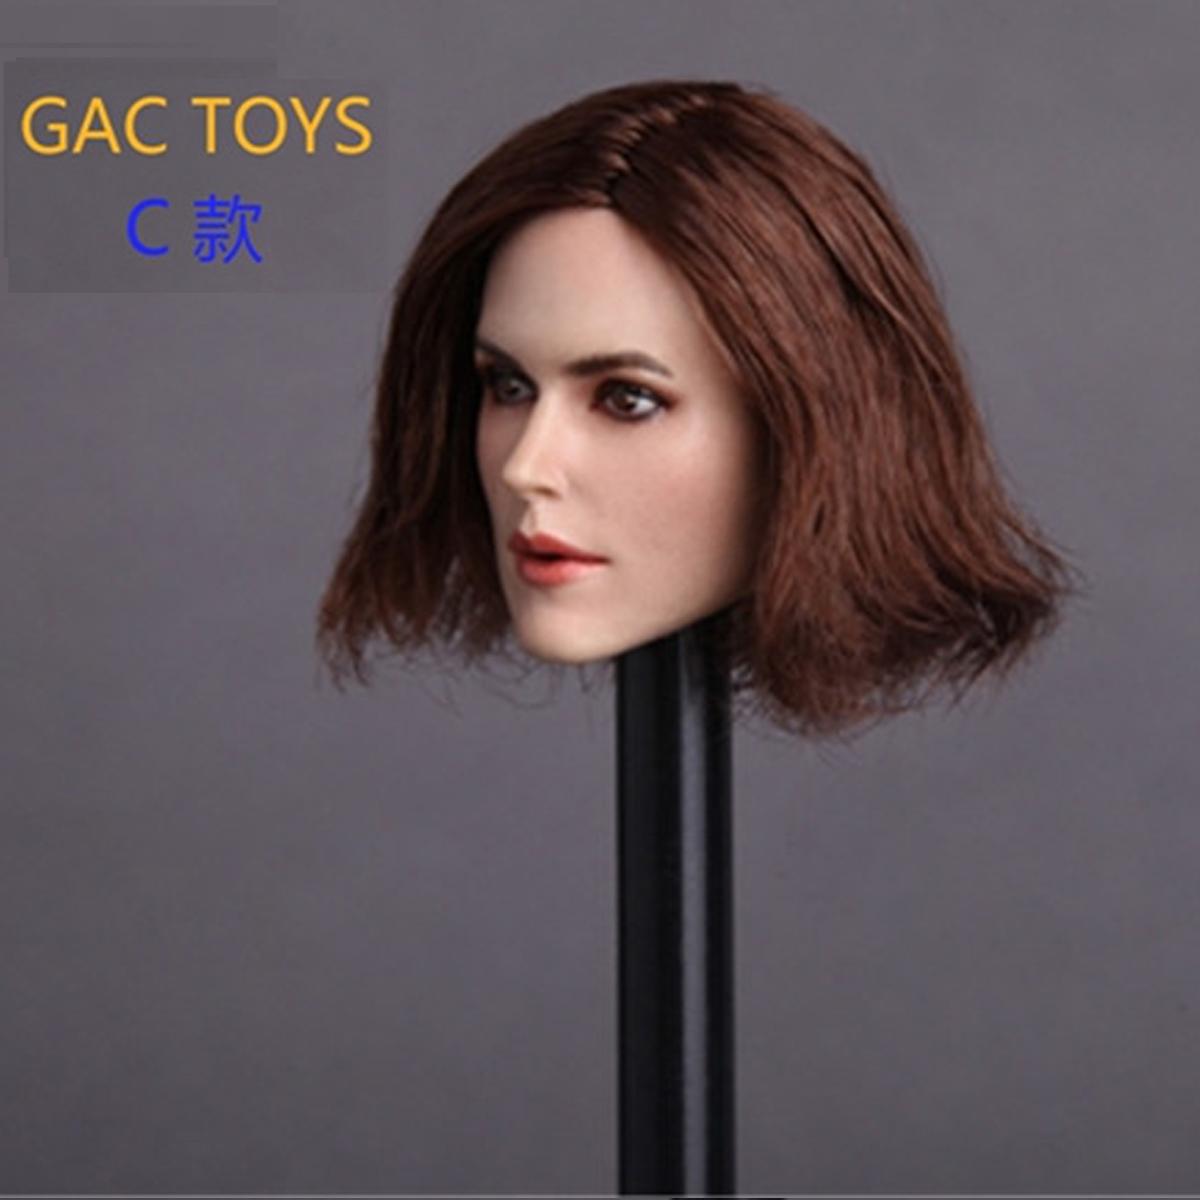 1//6 Female Keira Knightley Head Sculpt GC007 For Hot Toys Phicen Female Figure